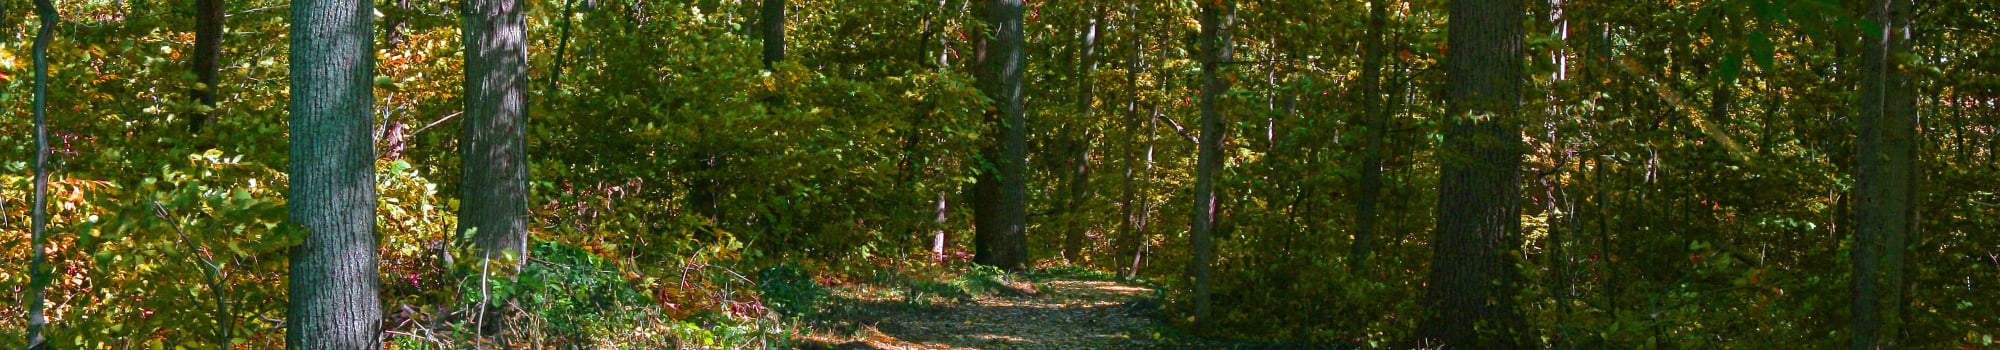 Join the Beztak team at Muirwood in Farmington/Farmington Hills, Michigan